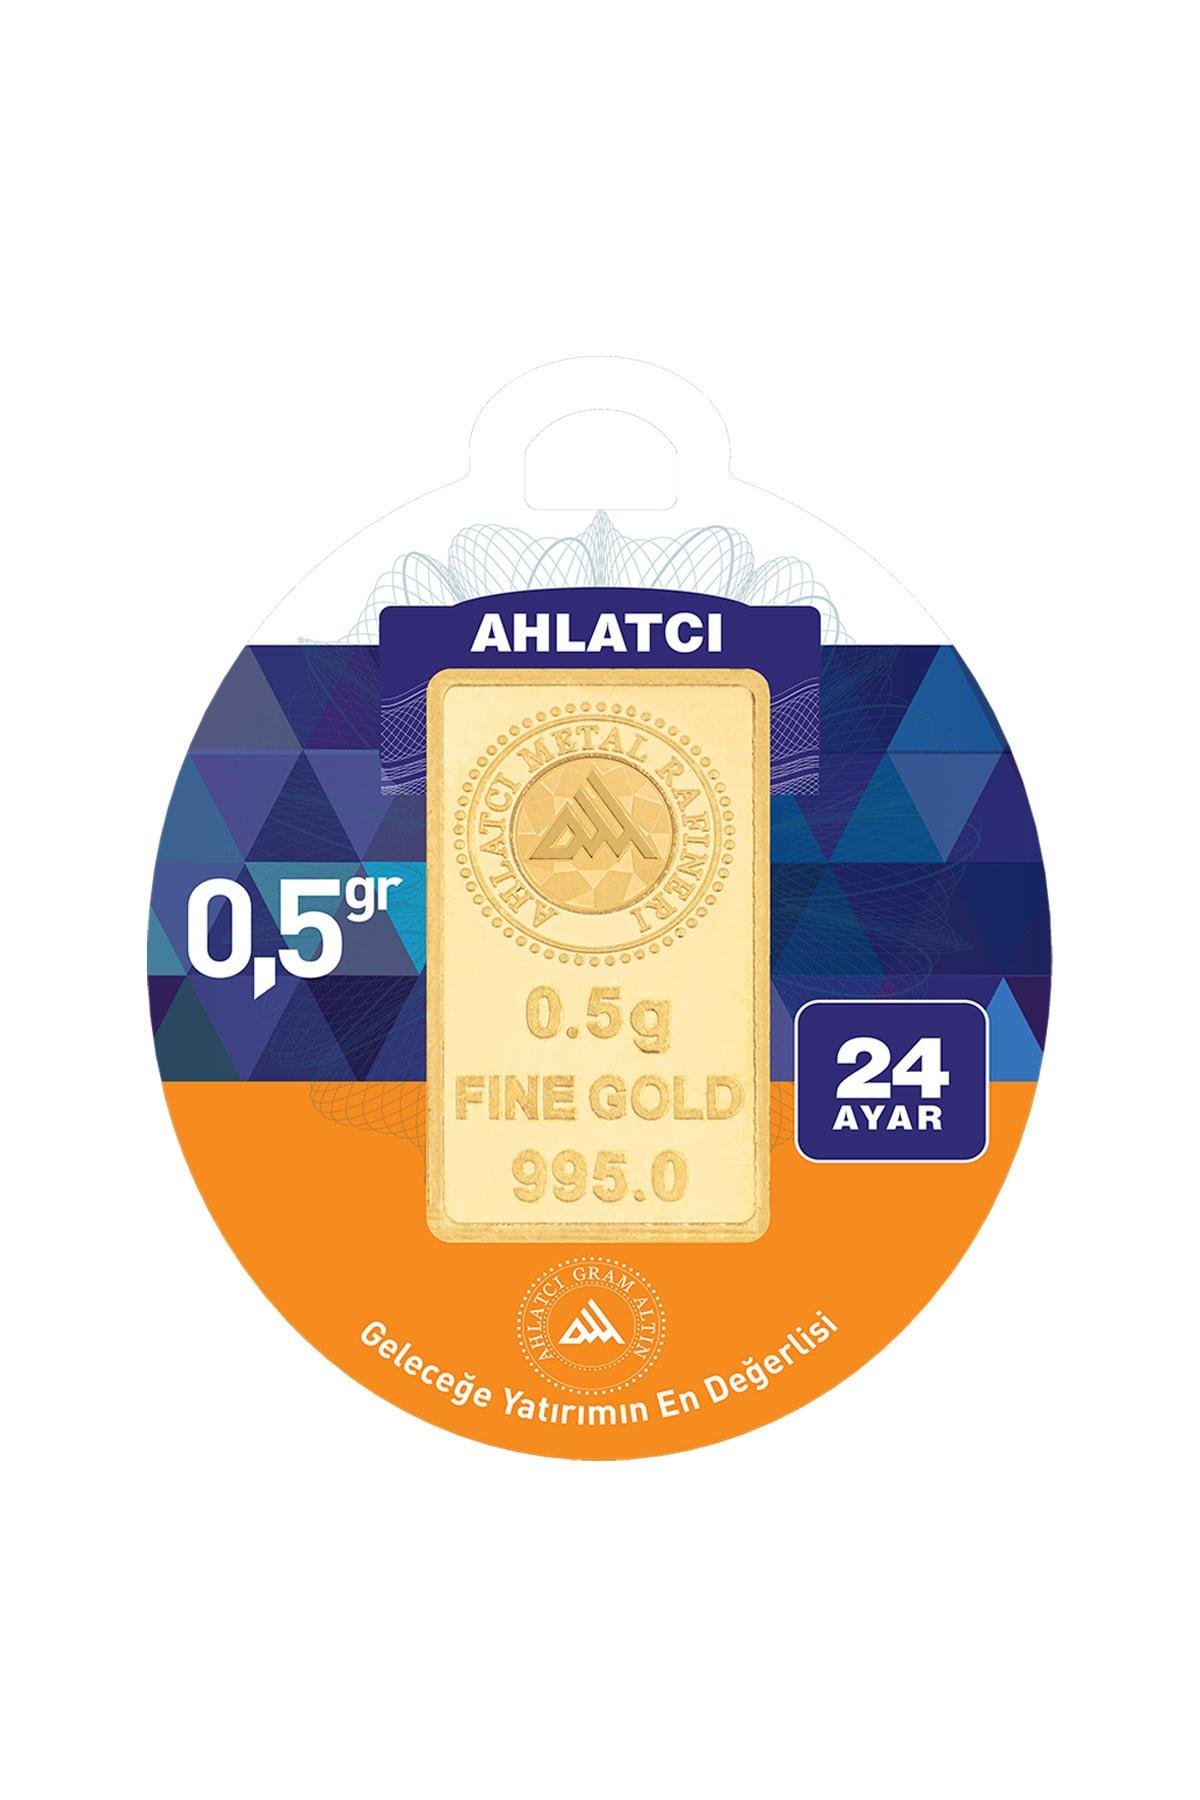 24 Ayar - 0.5g Altın